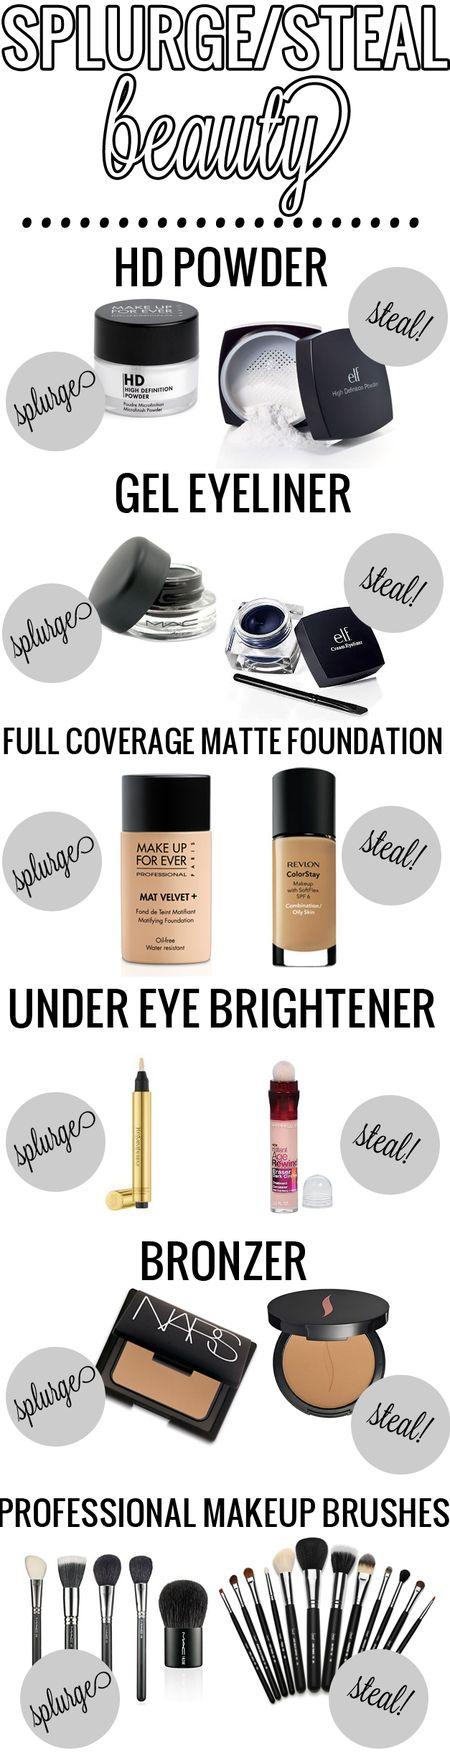 Splurge/Steal Beauty #DrugstoreDupes